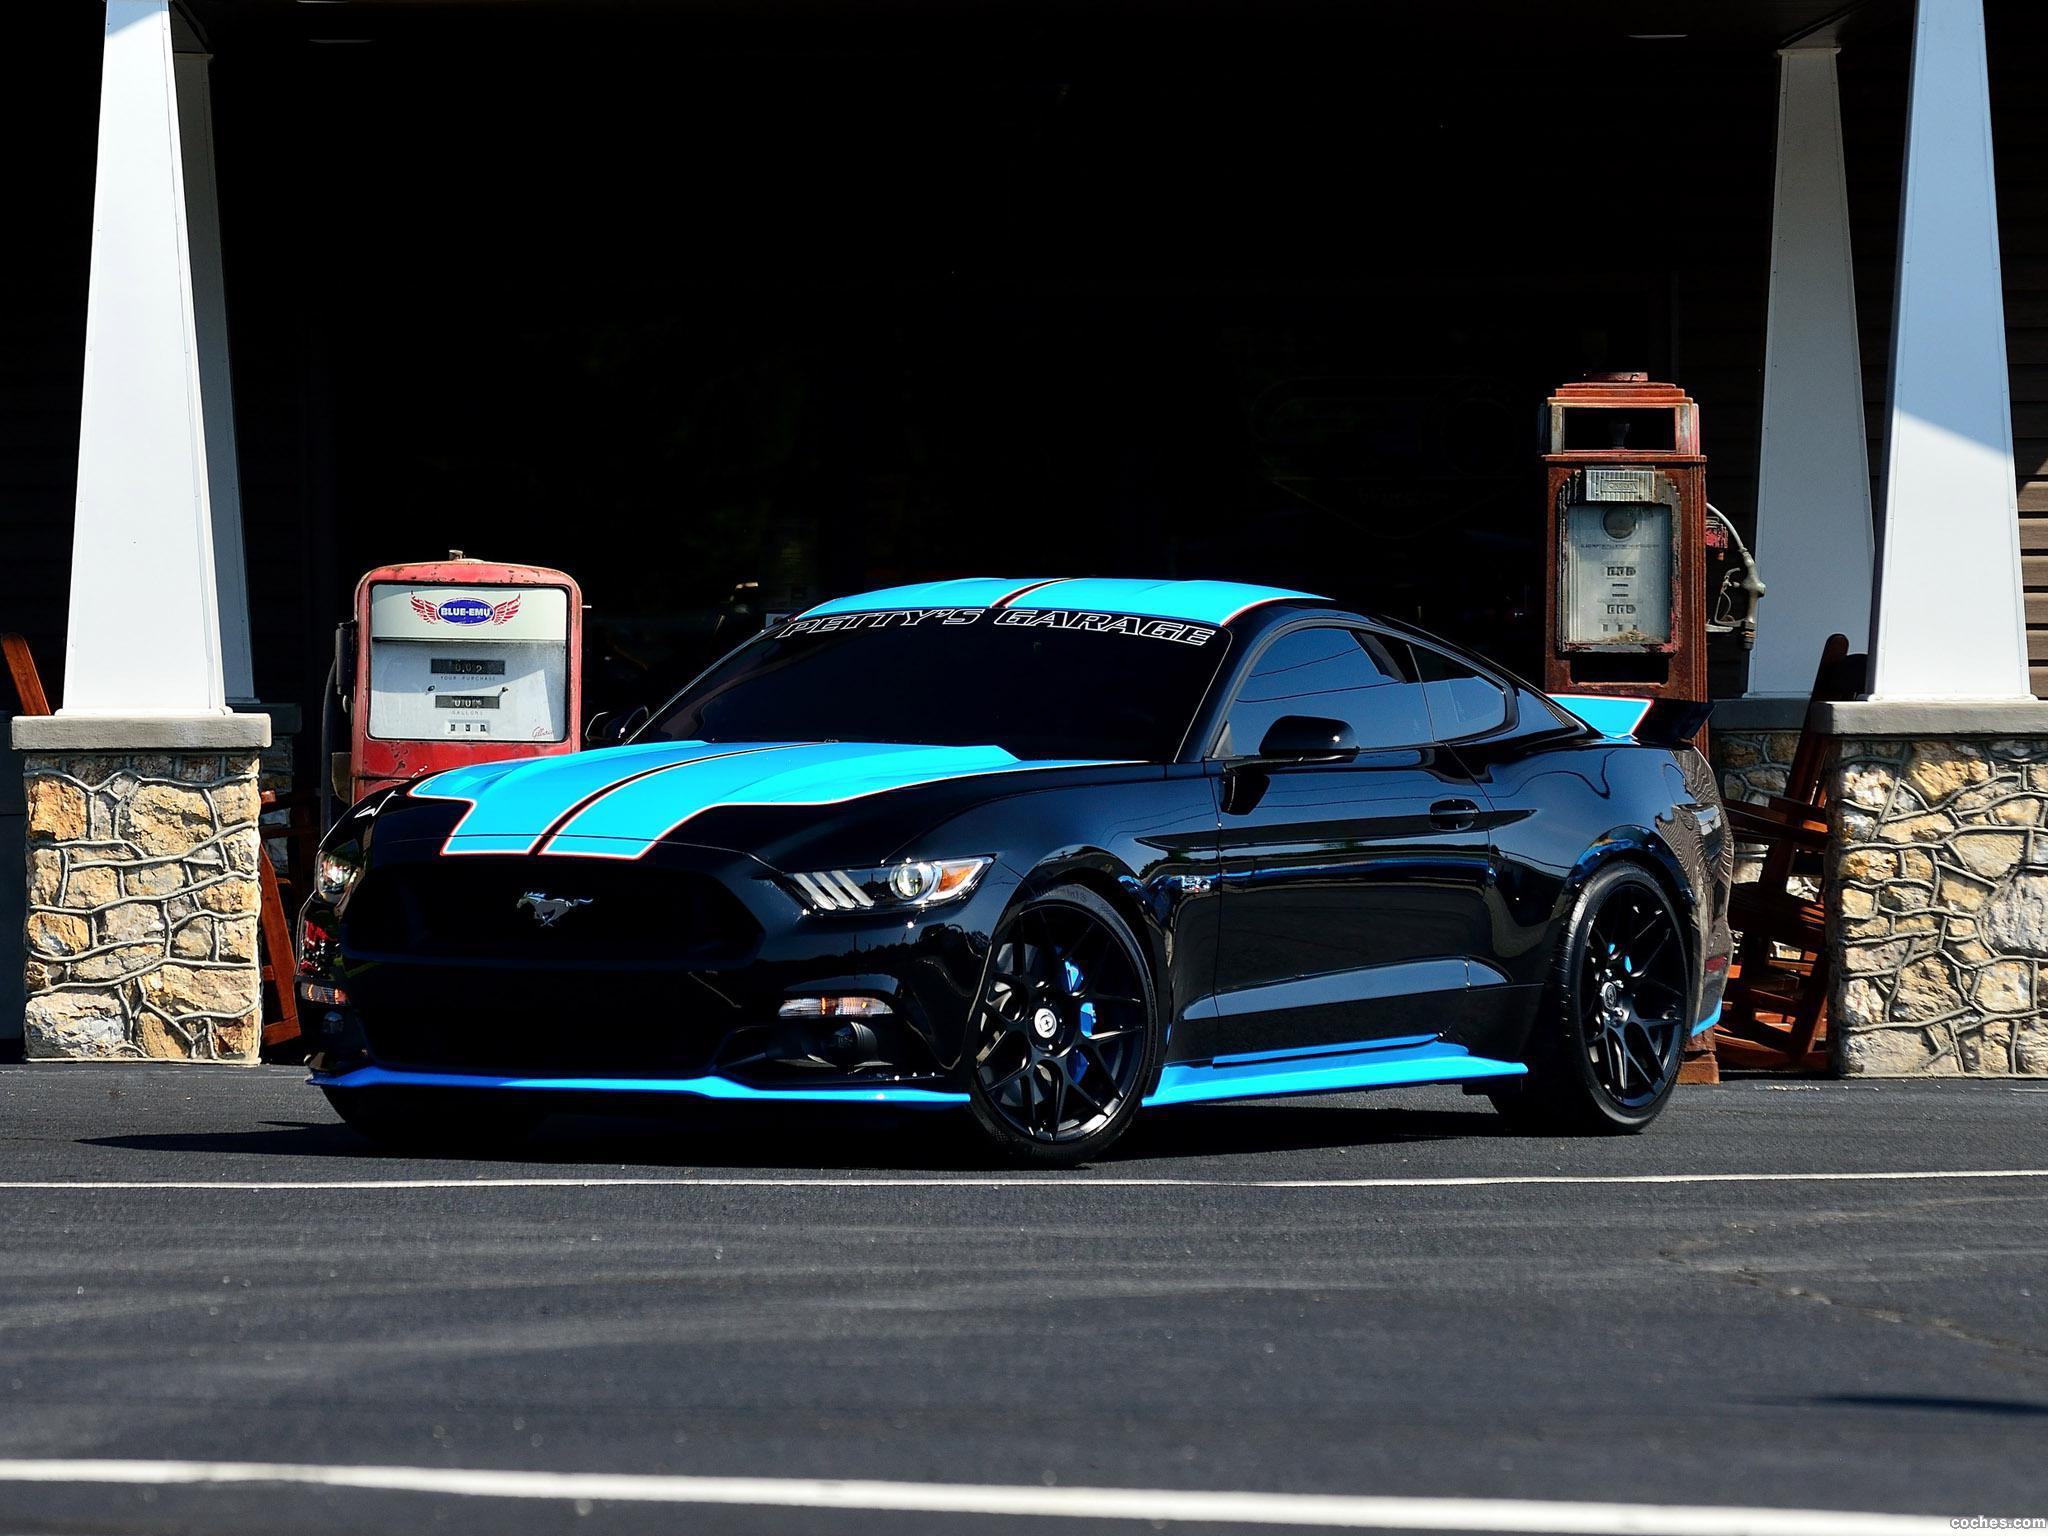 Foto 4 de Ford Mustang GT Fastback Pettys Garage 2015